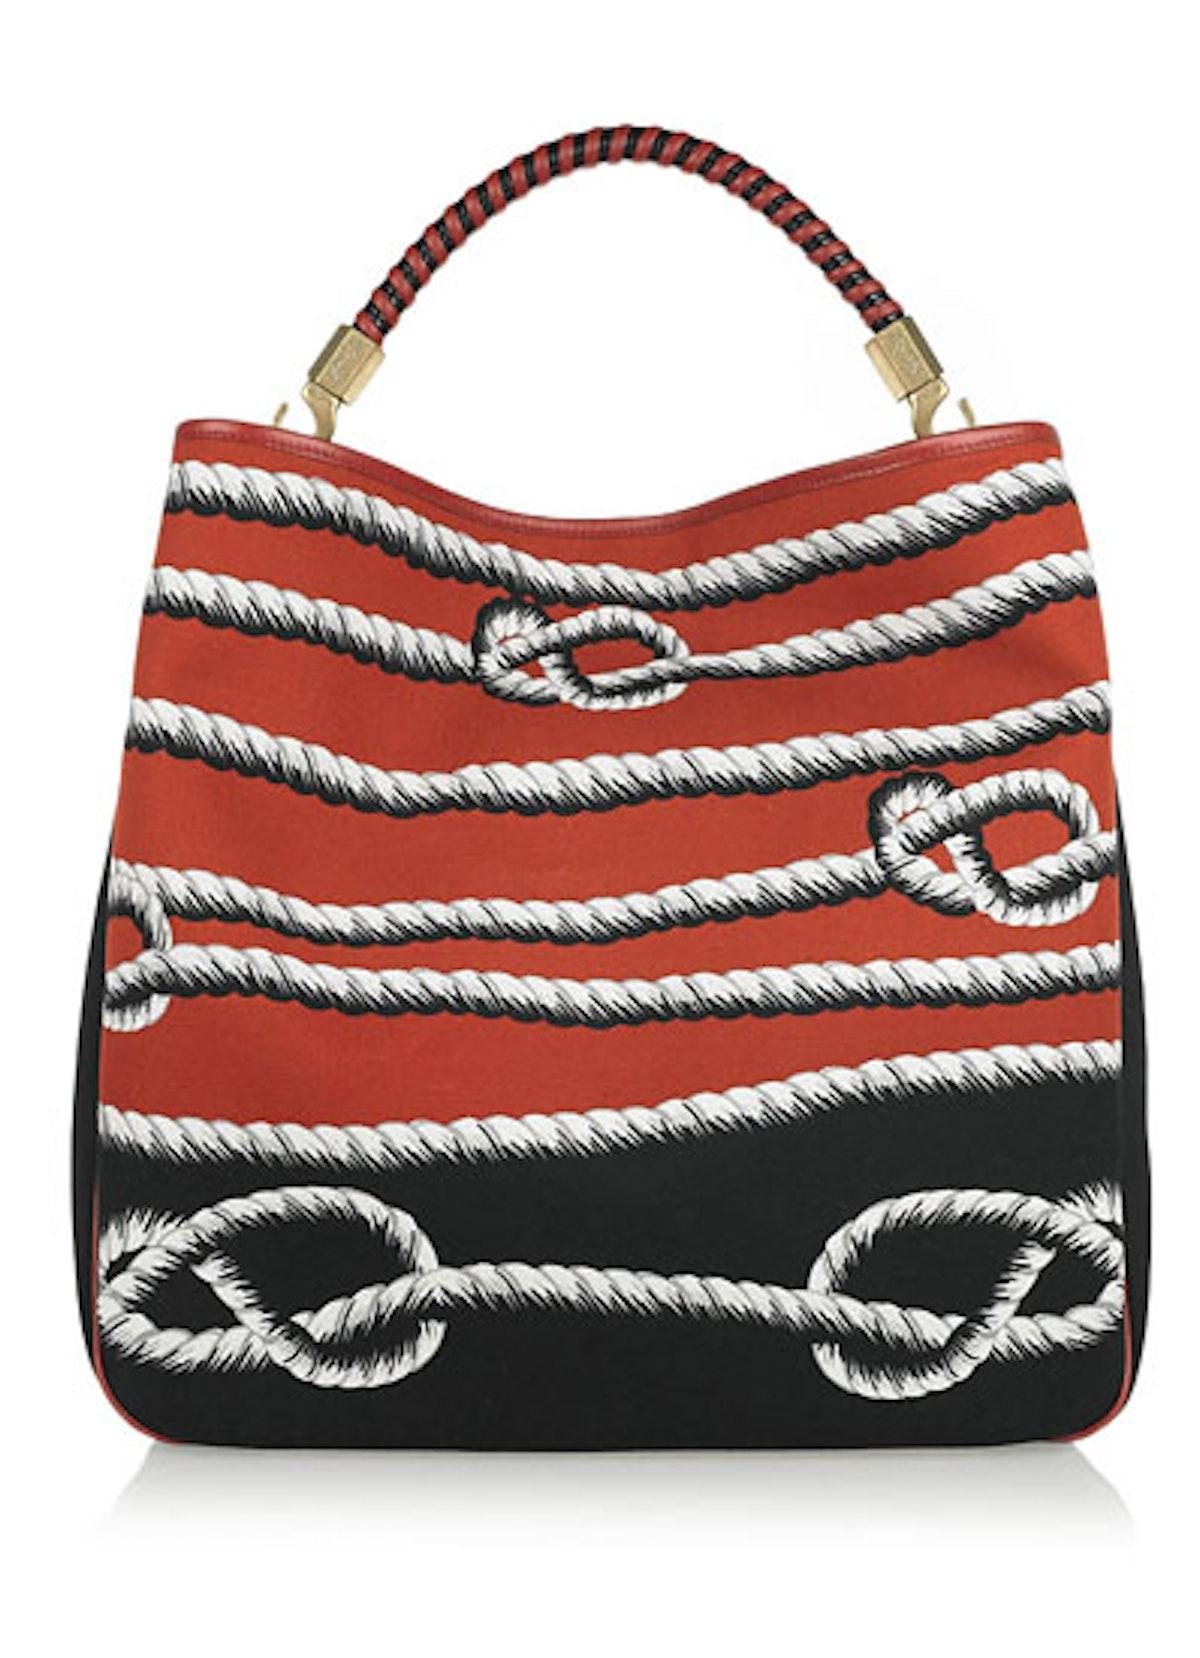 acss-nautical-accessories-06-v.jpg